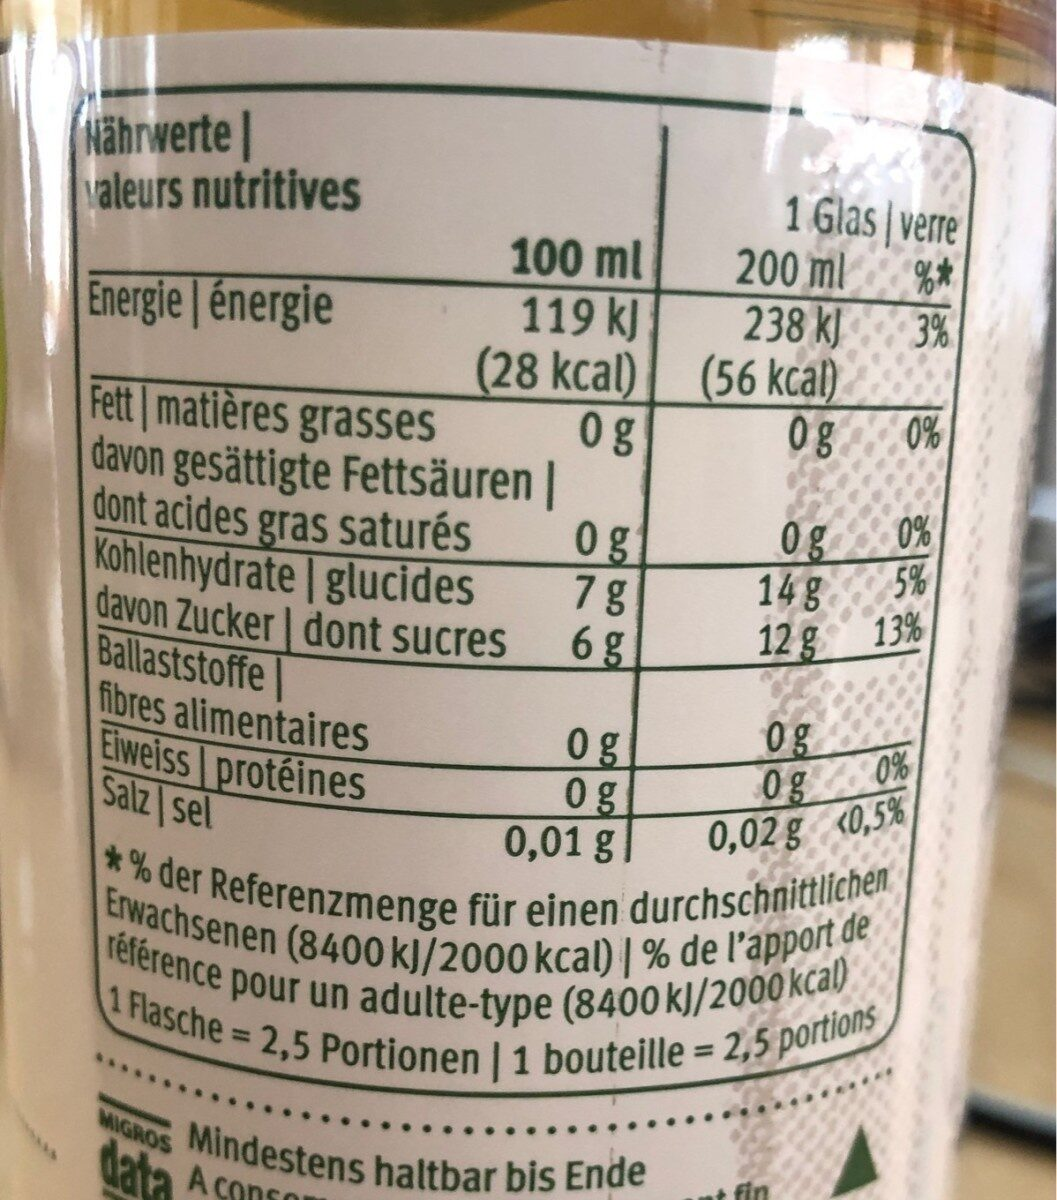 Apfelschorle klar, mit Kohlensäure - Nutrition facts - fr